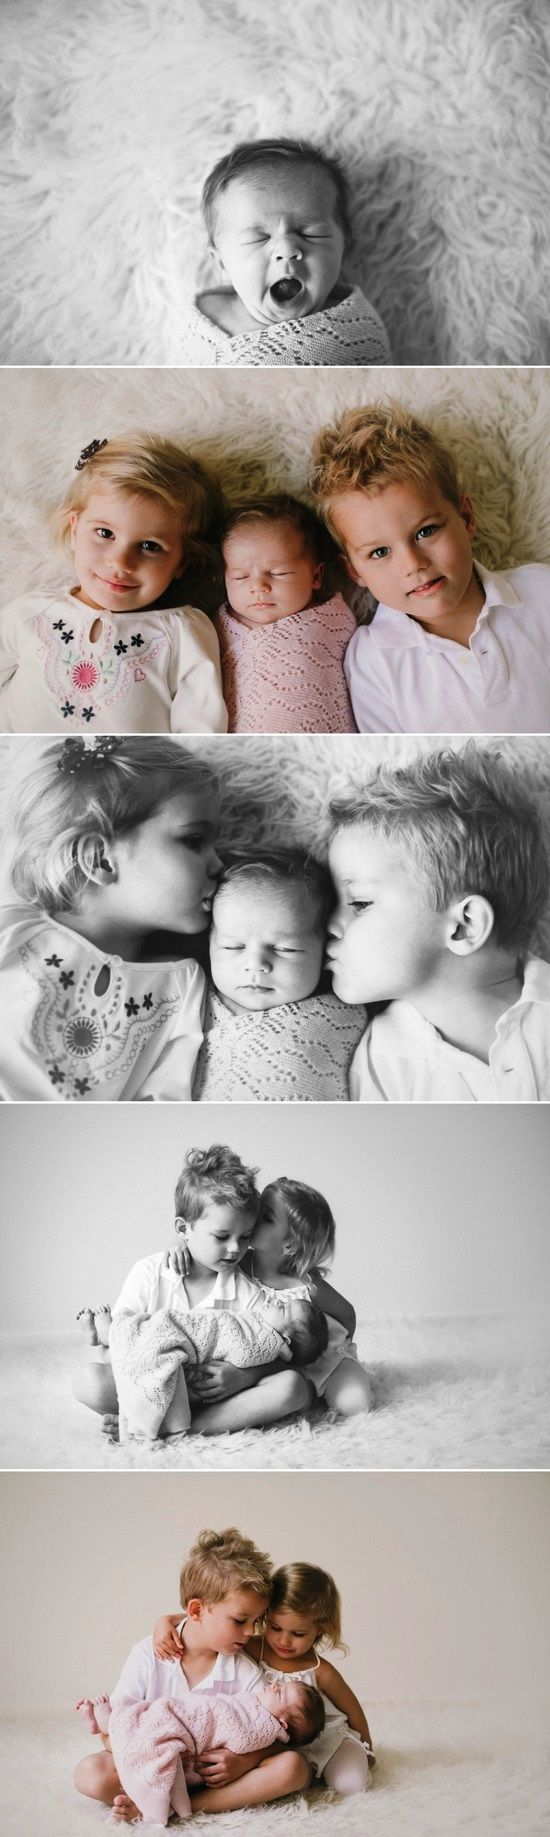 Newborn infant with siblings Toni Kami ~•❤• Bébé •❤•~ Precious family newborn baby photography idea Anya Maria Photography